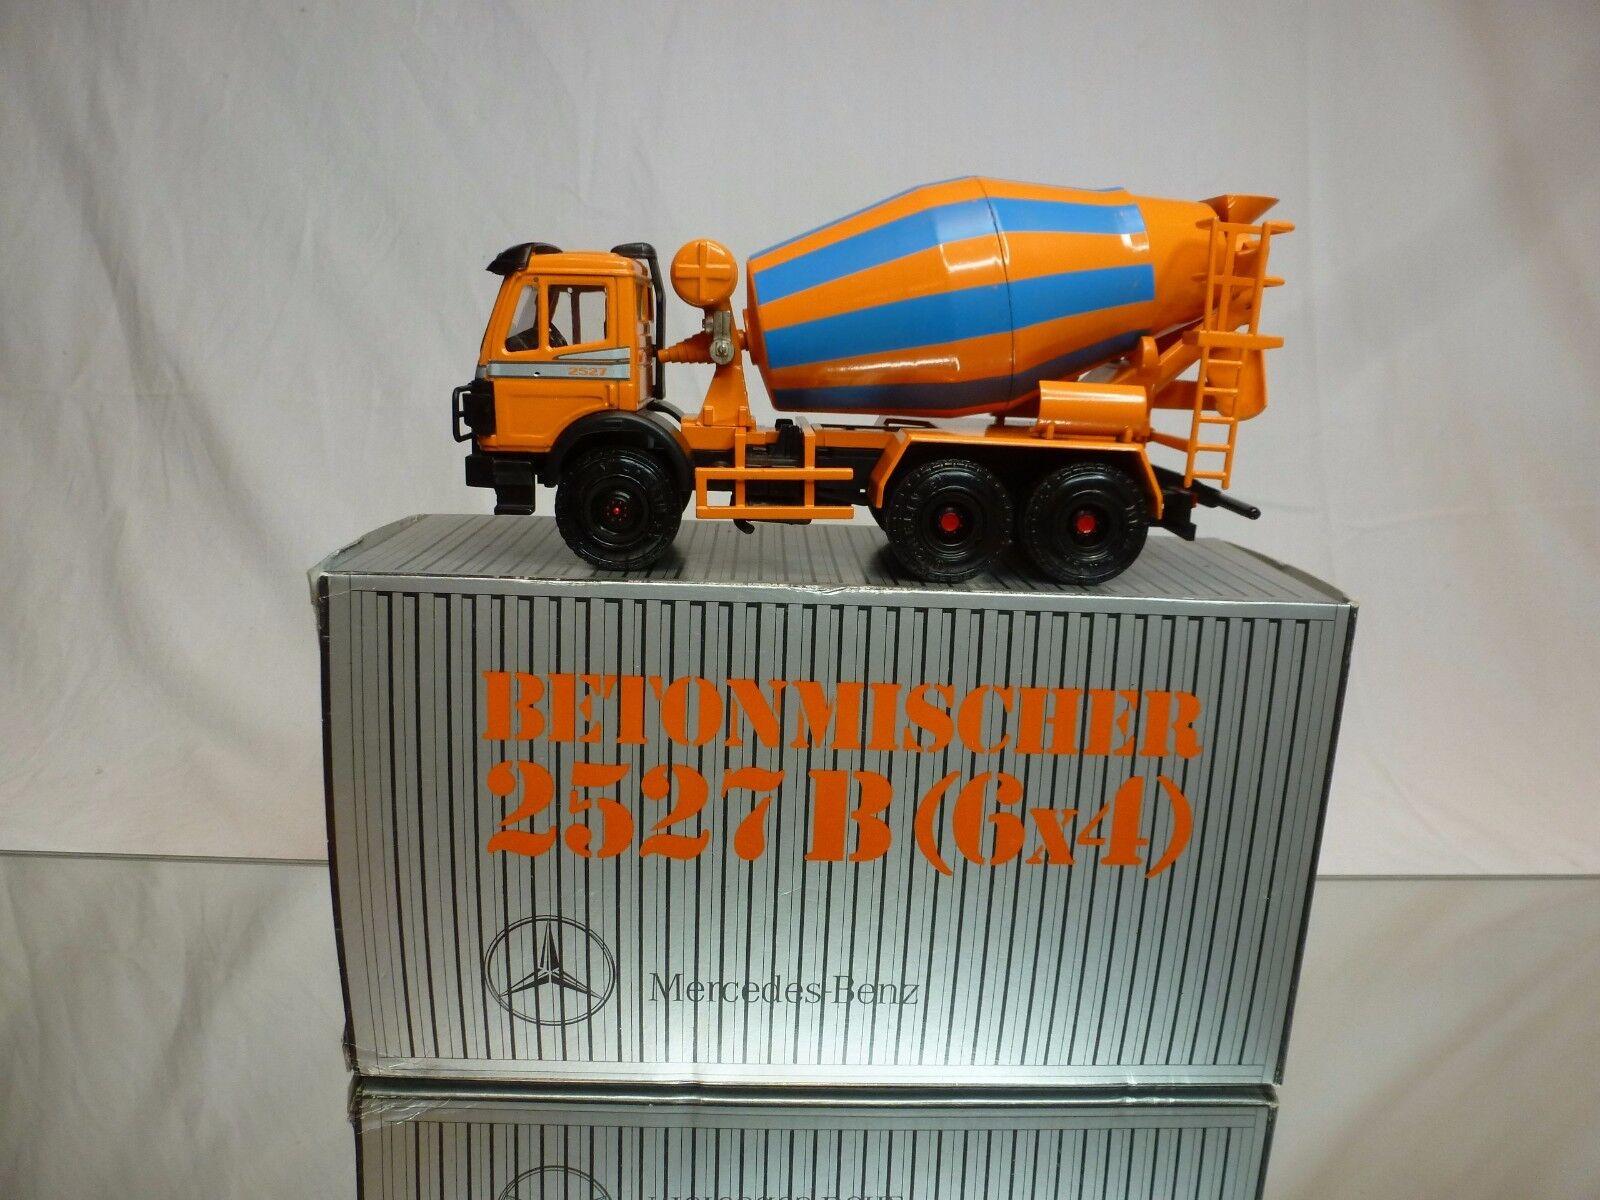 NZG MODELLE 384 MERCEDES BENZ 2527B CONCRETE MIXER - 1 43 - VERY GOOD  IN BOX